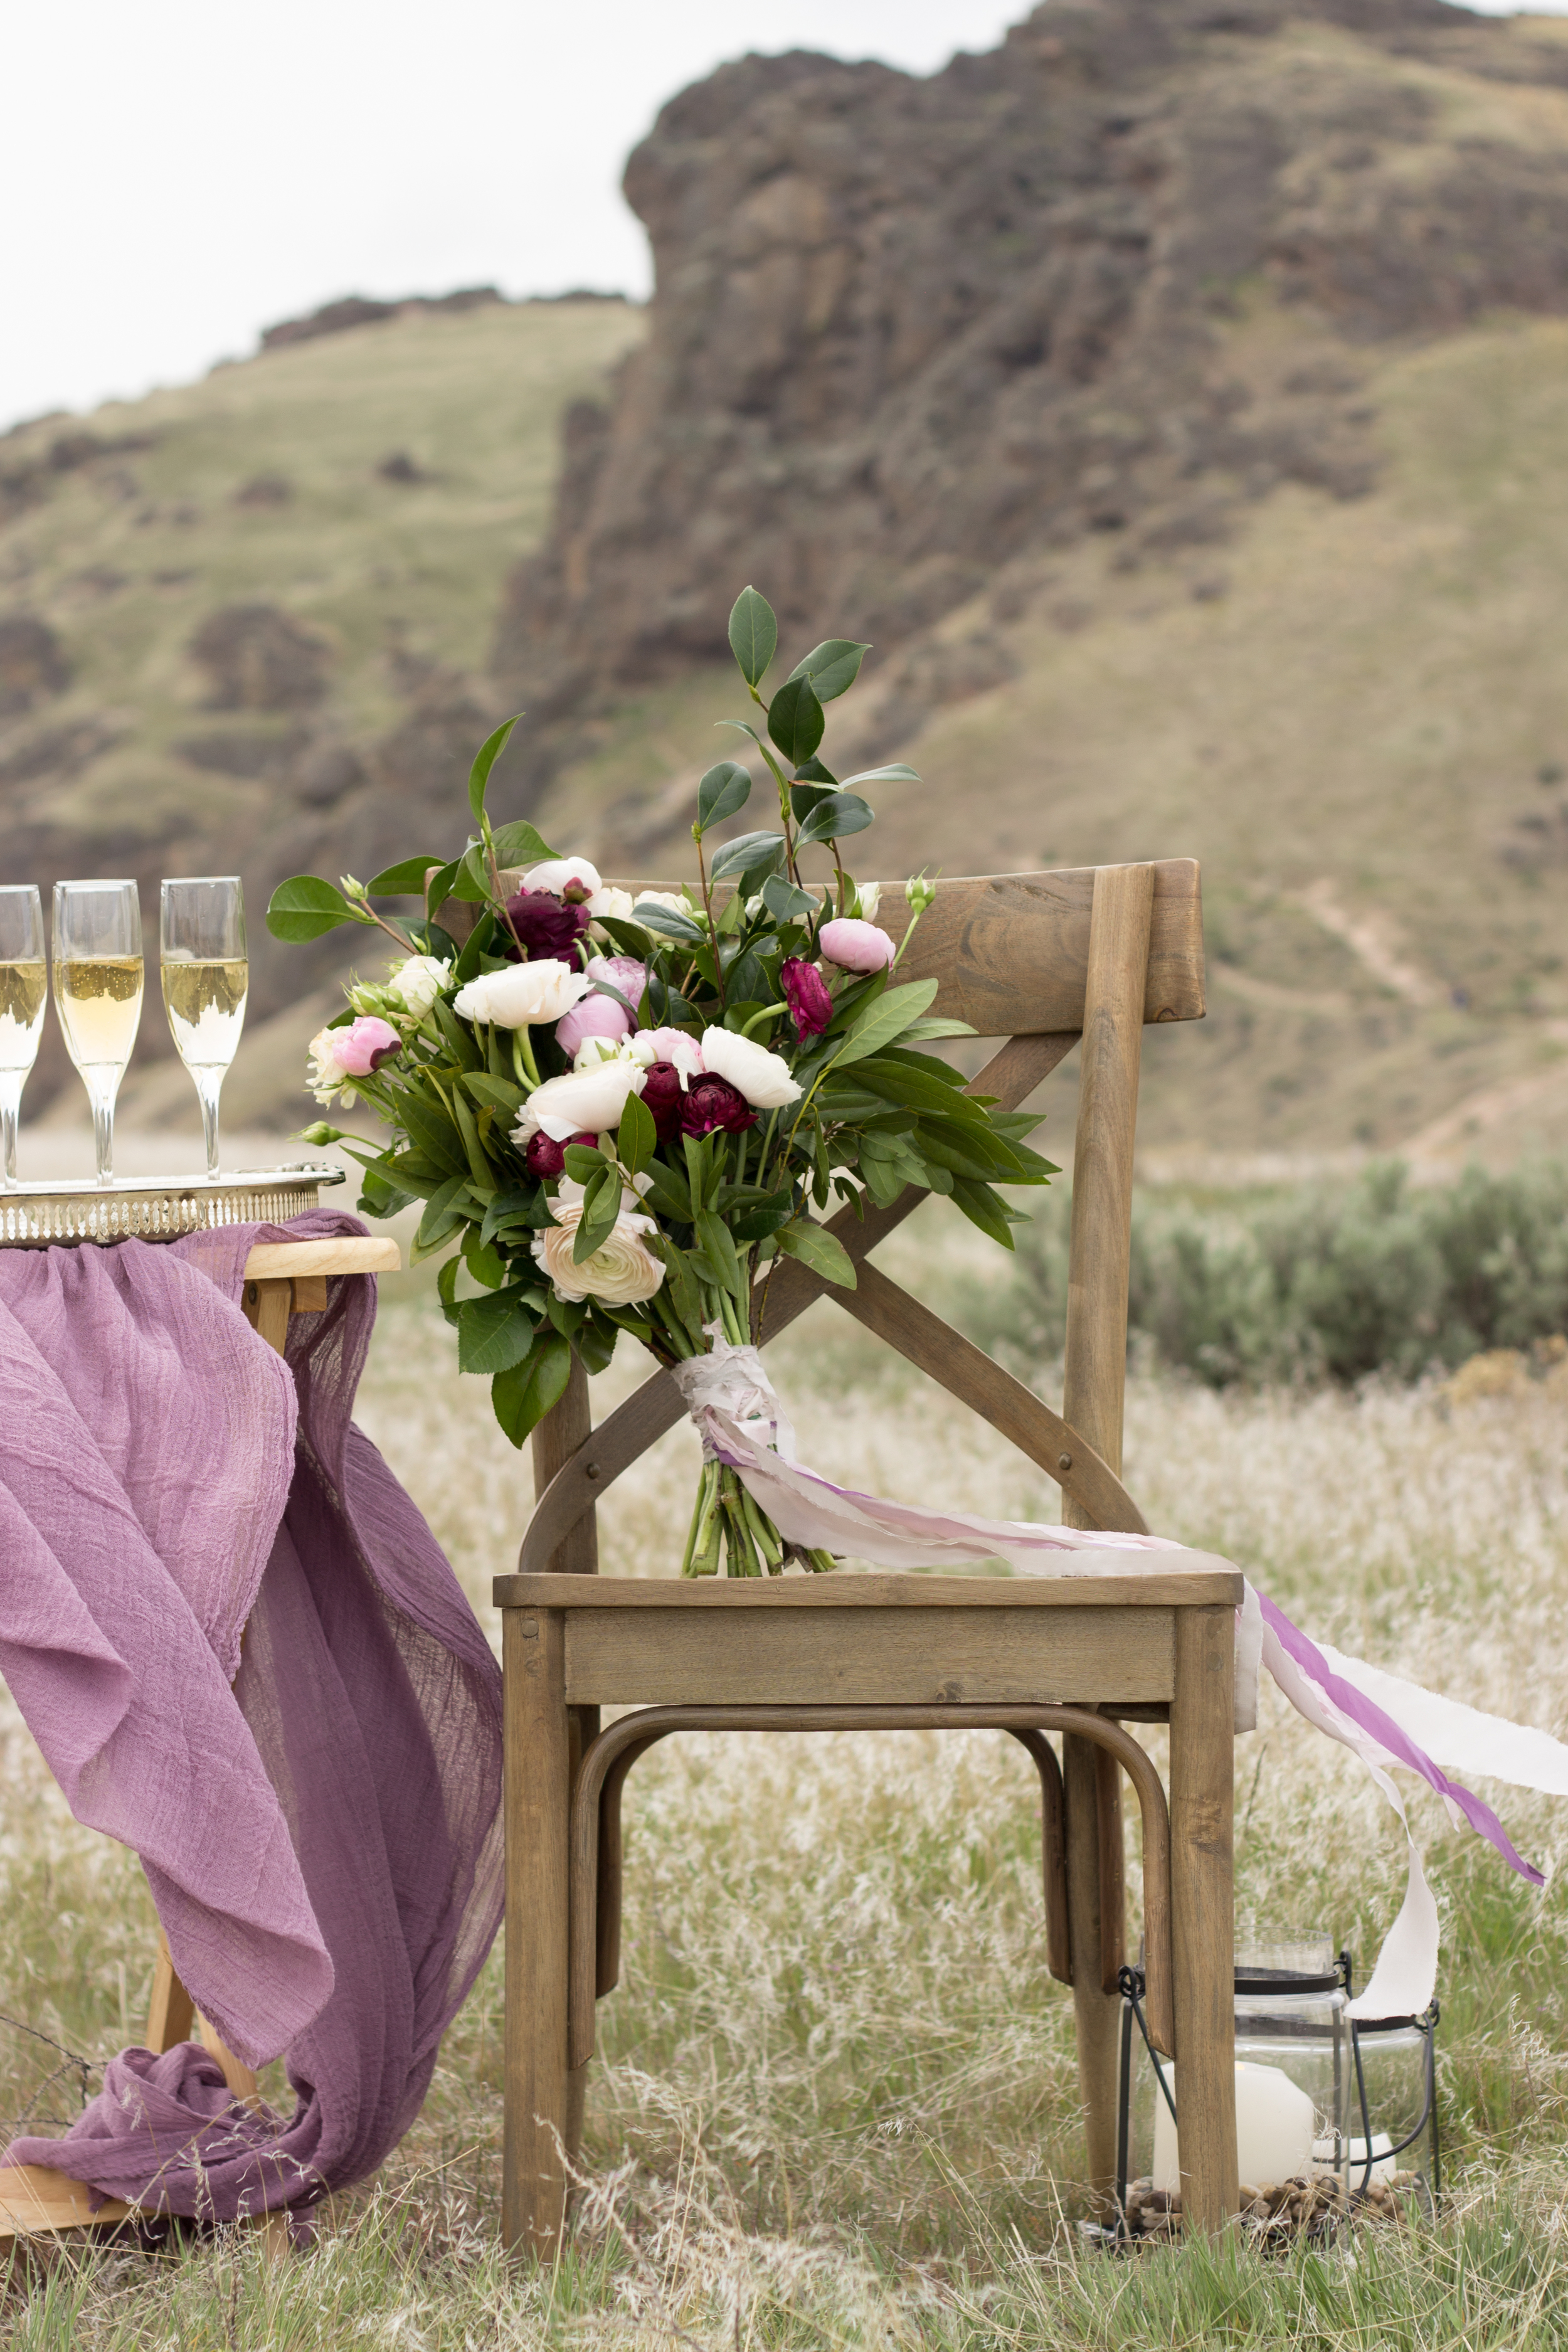 bouquet-on-chair.jpg